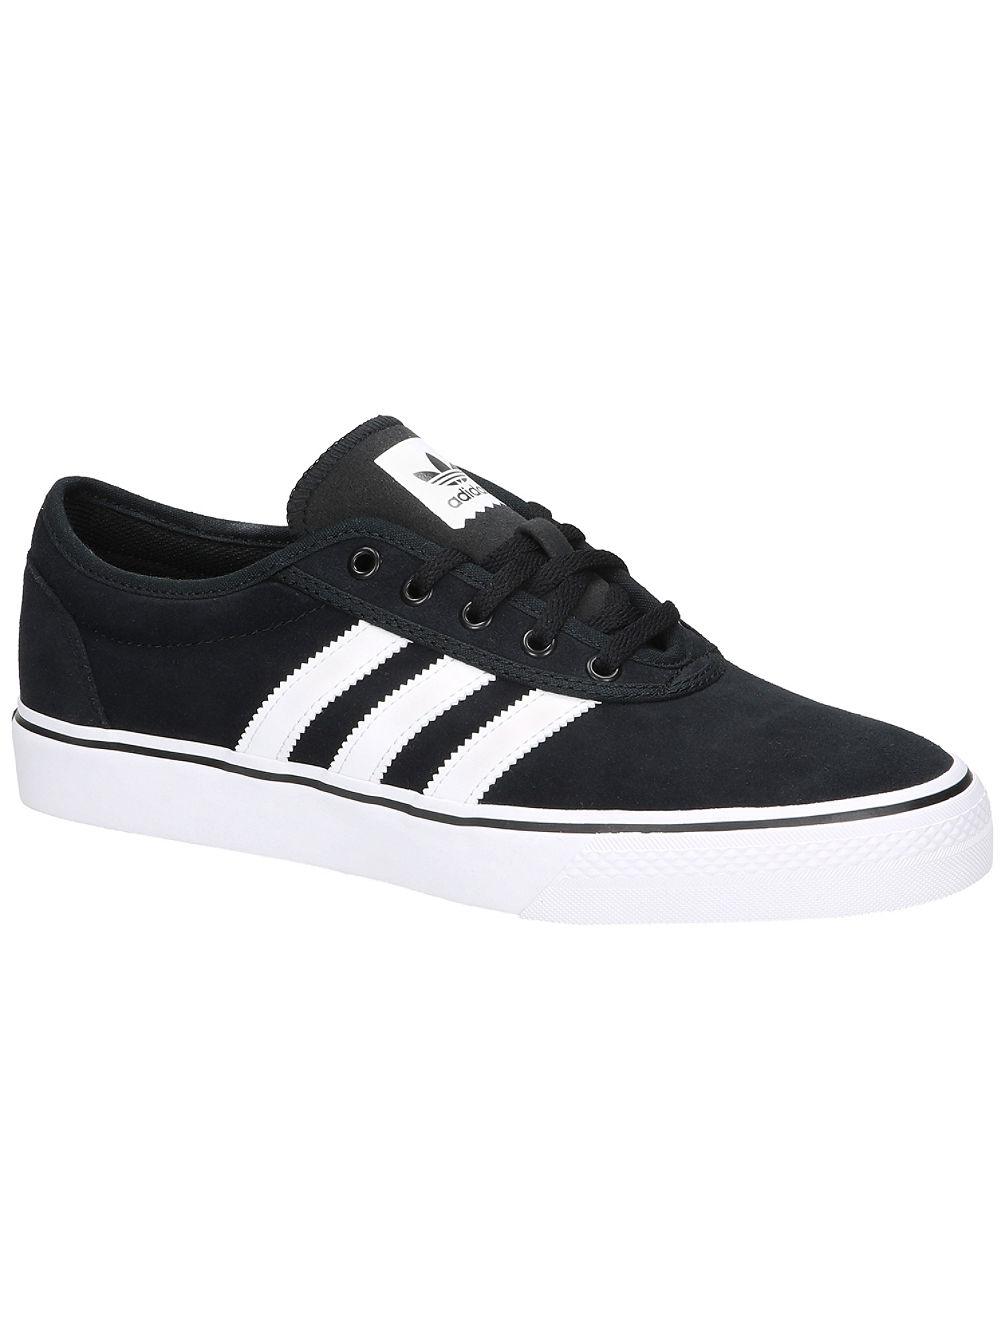 size 40 c9fd4 9fac1 Compra adidas Skateboarding Adi Ease Scarpe da Skate online su Blue Tomato